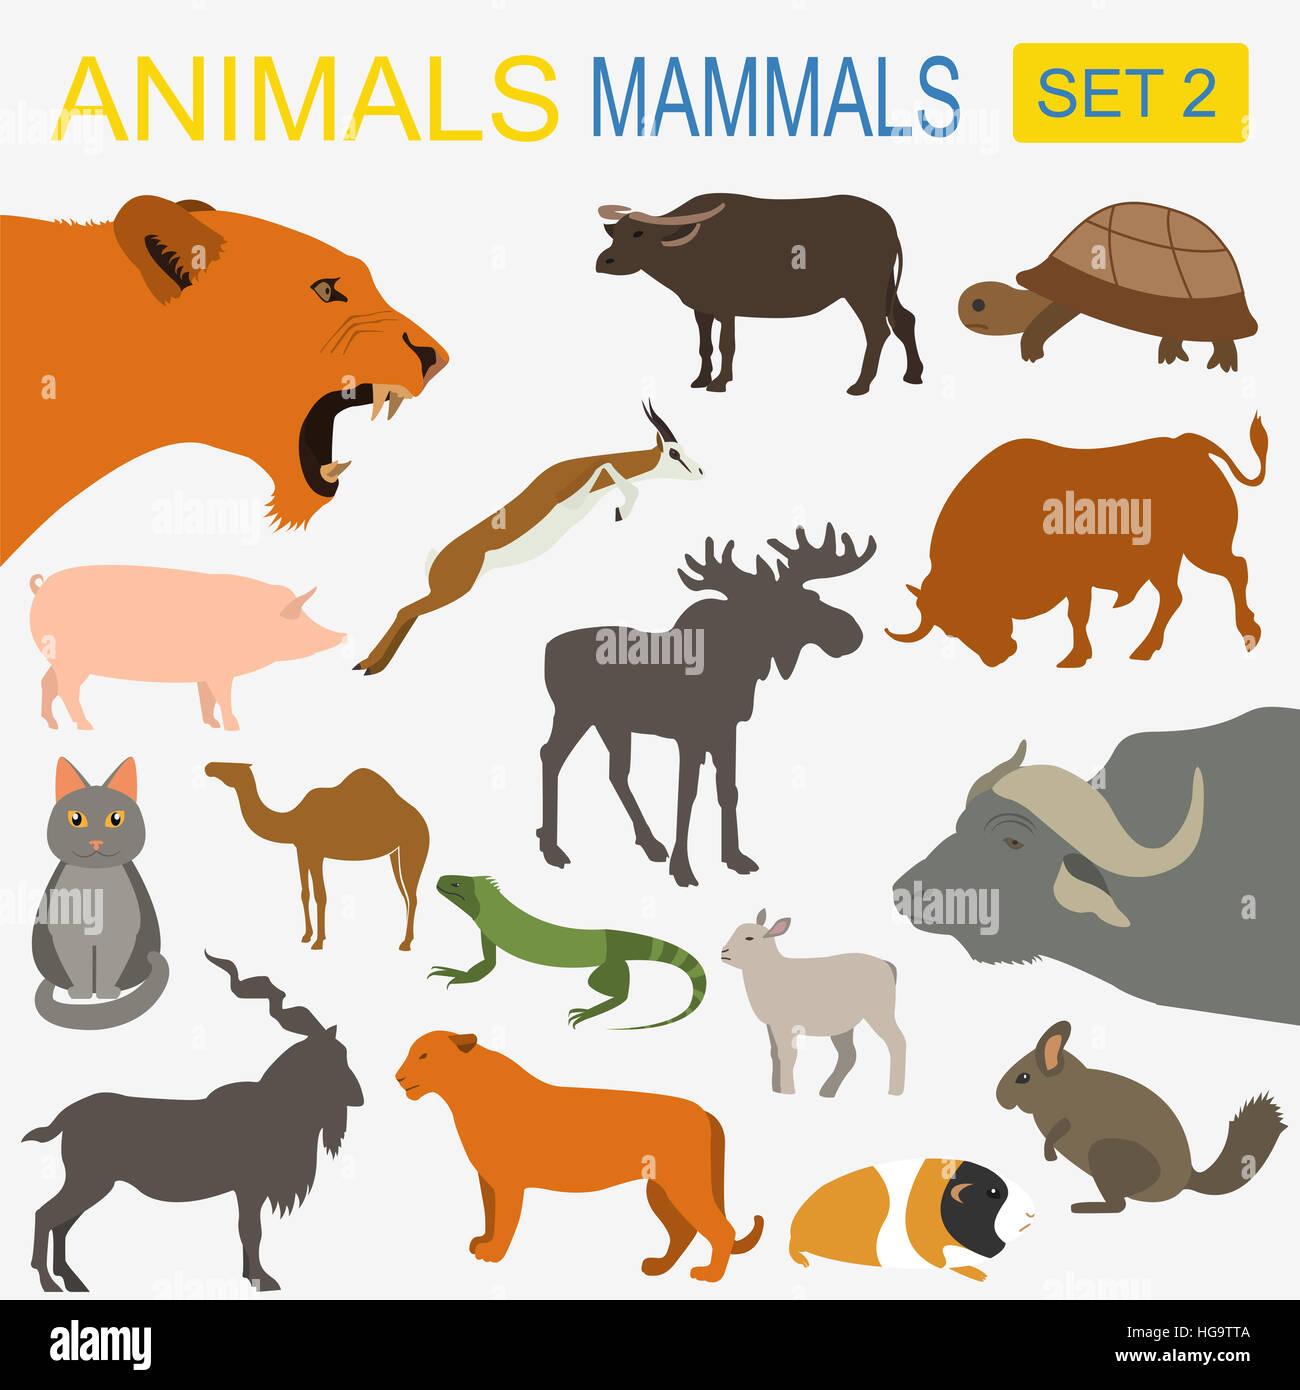 Animals Mammals Icon Set Vector Flat Style Vector